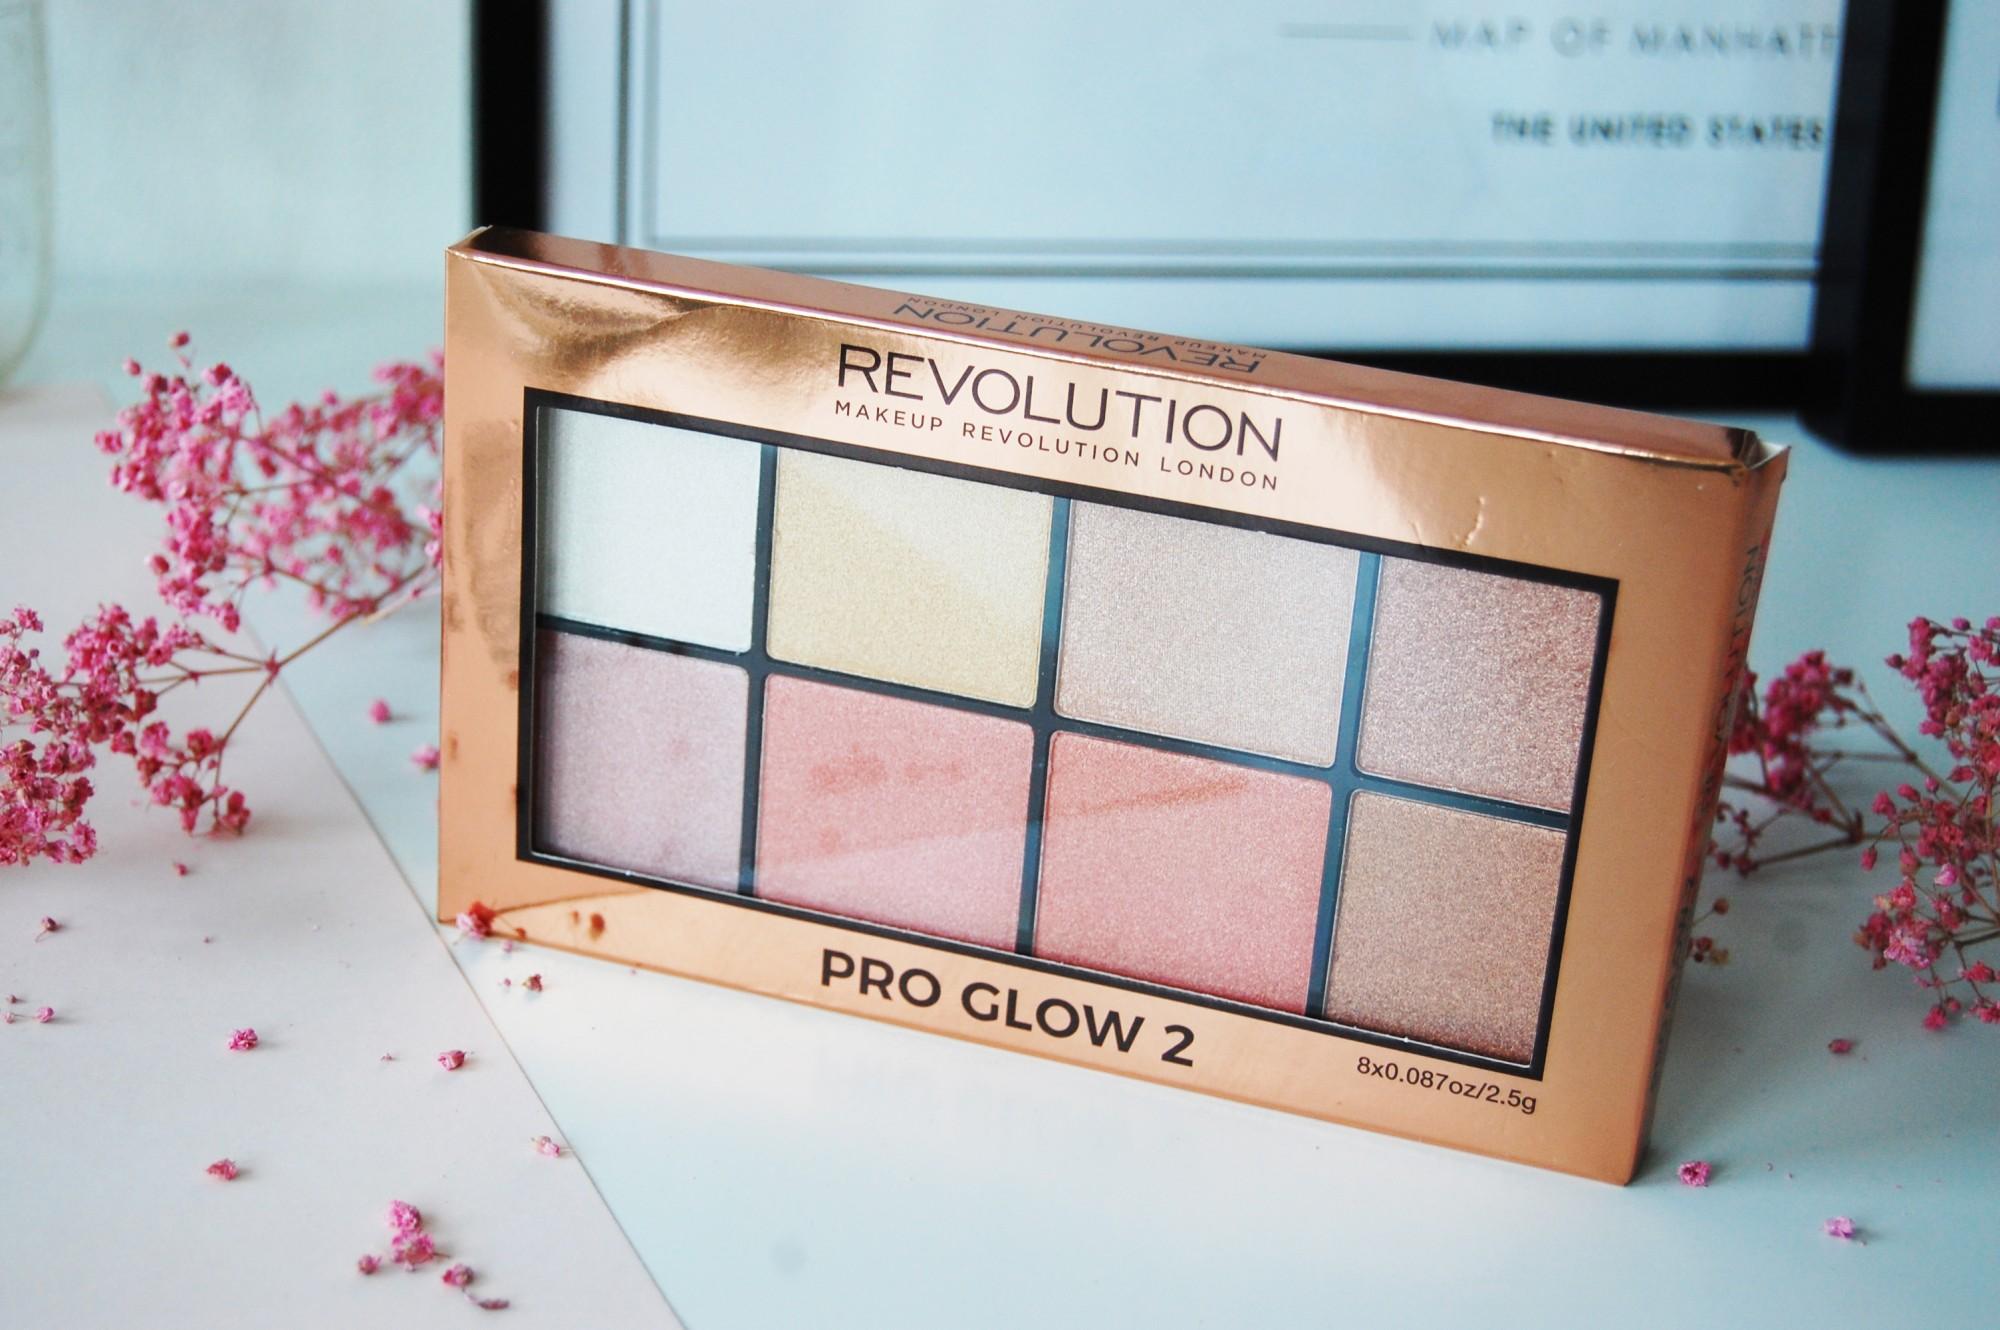 Makeup Revolution Pro Glow 2